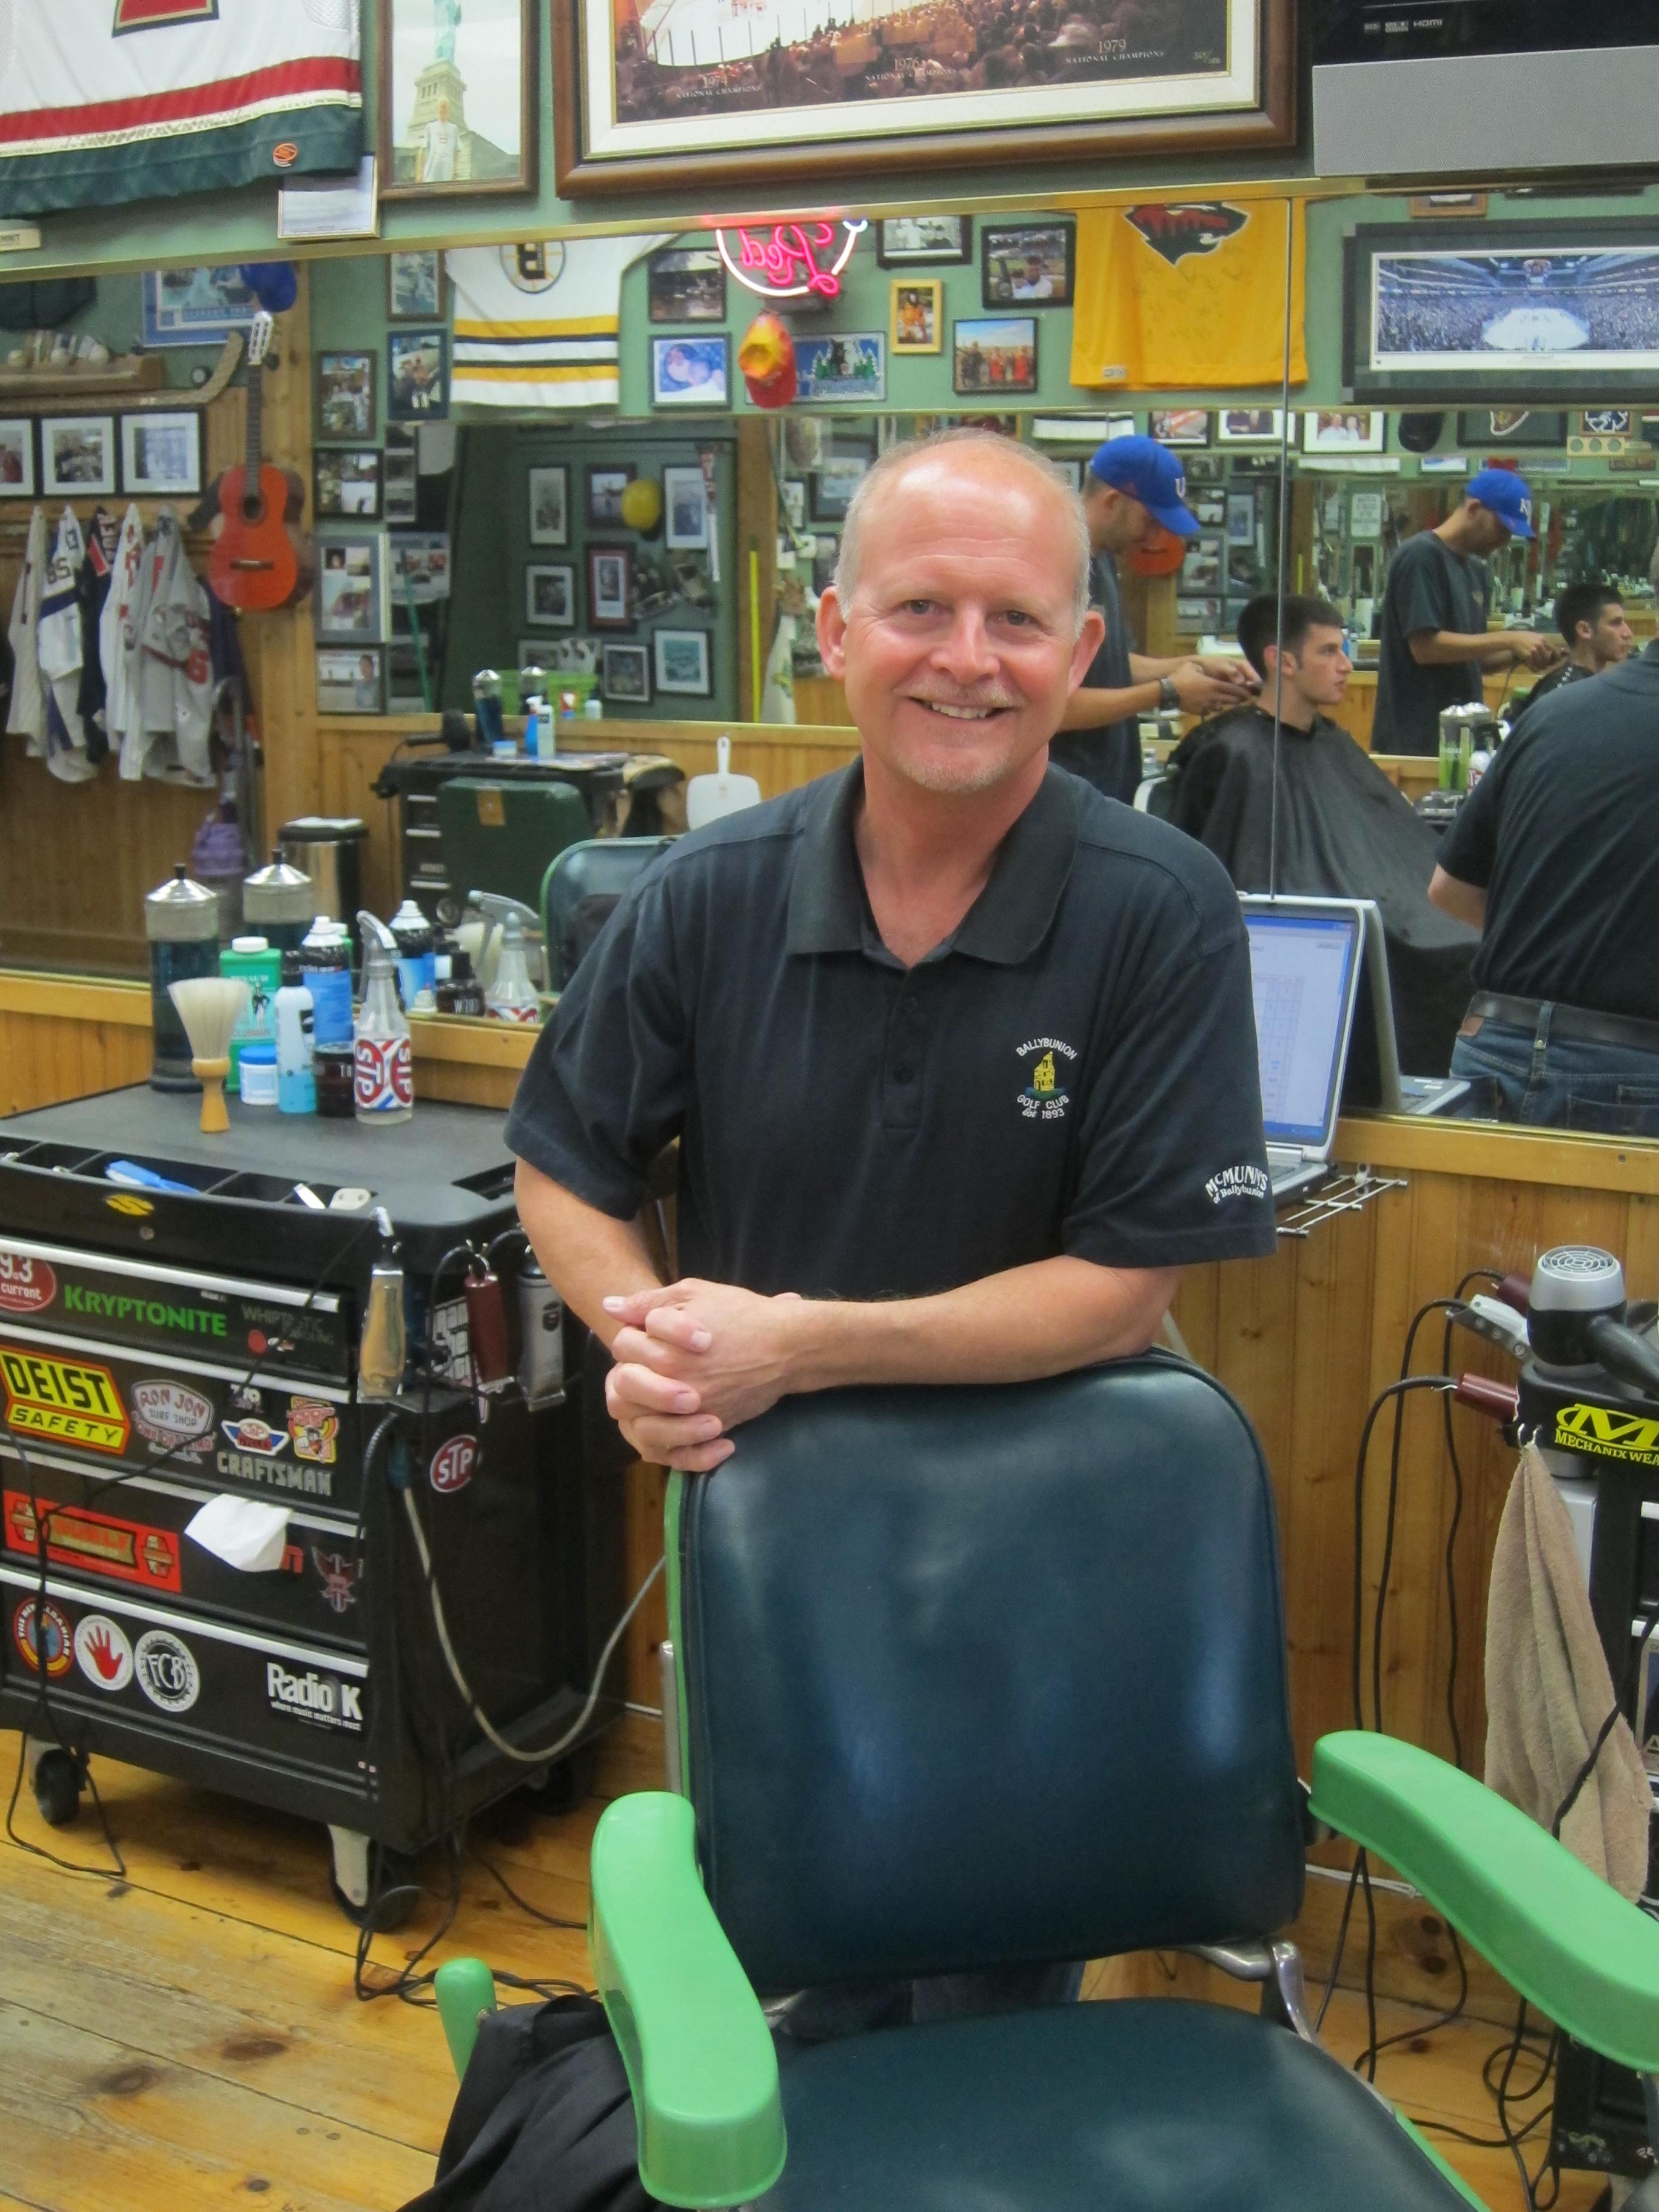 Gene the barber at Dick's Barbers Edina